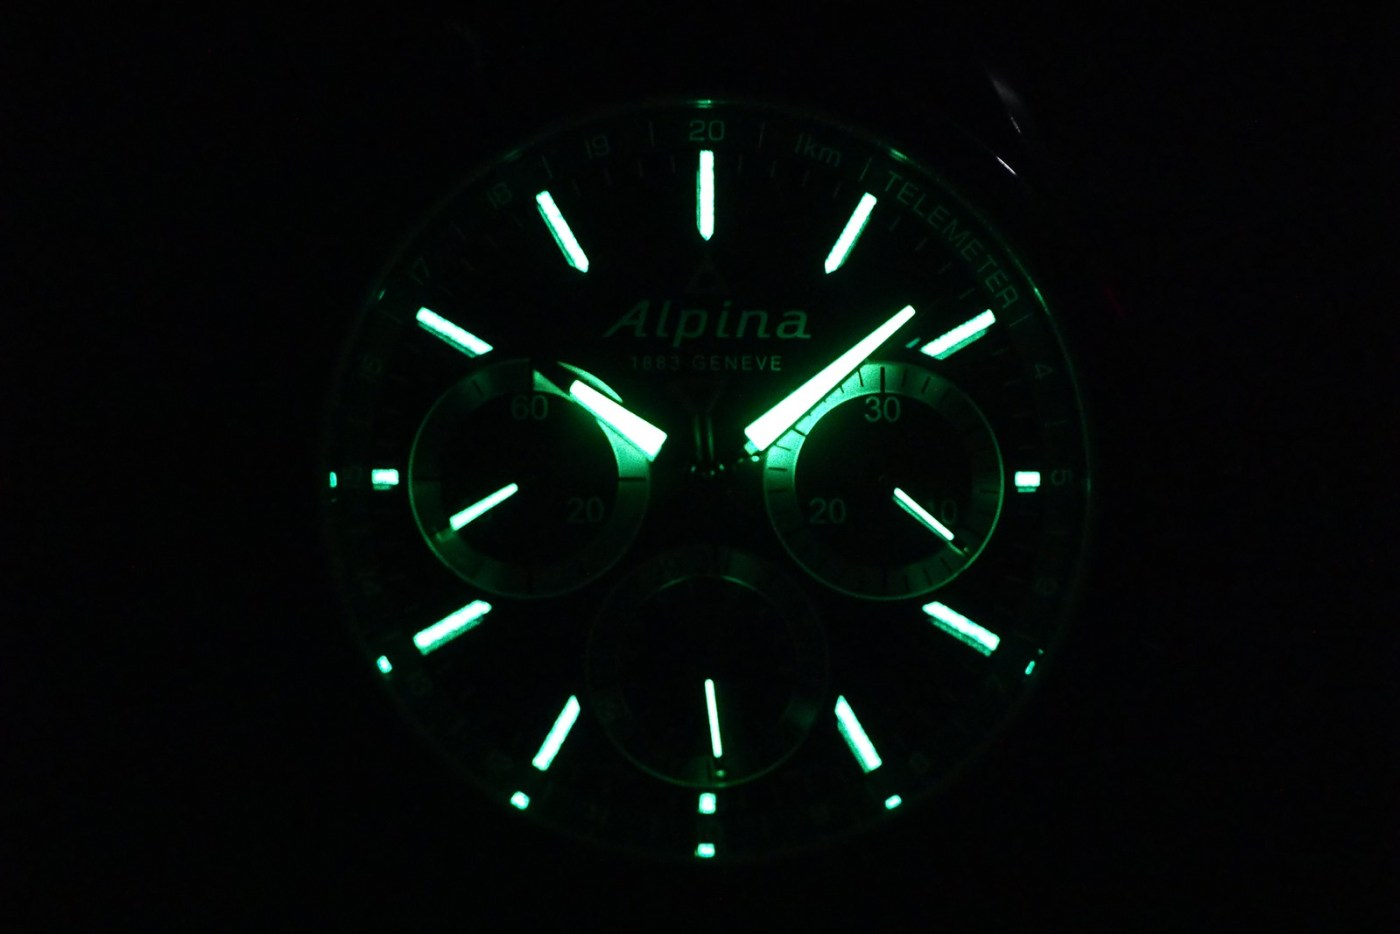 Alpina Alpiner 4 Chronoflyback lumeshot